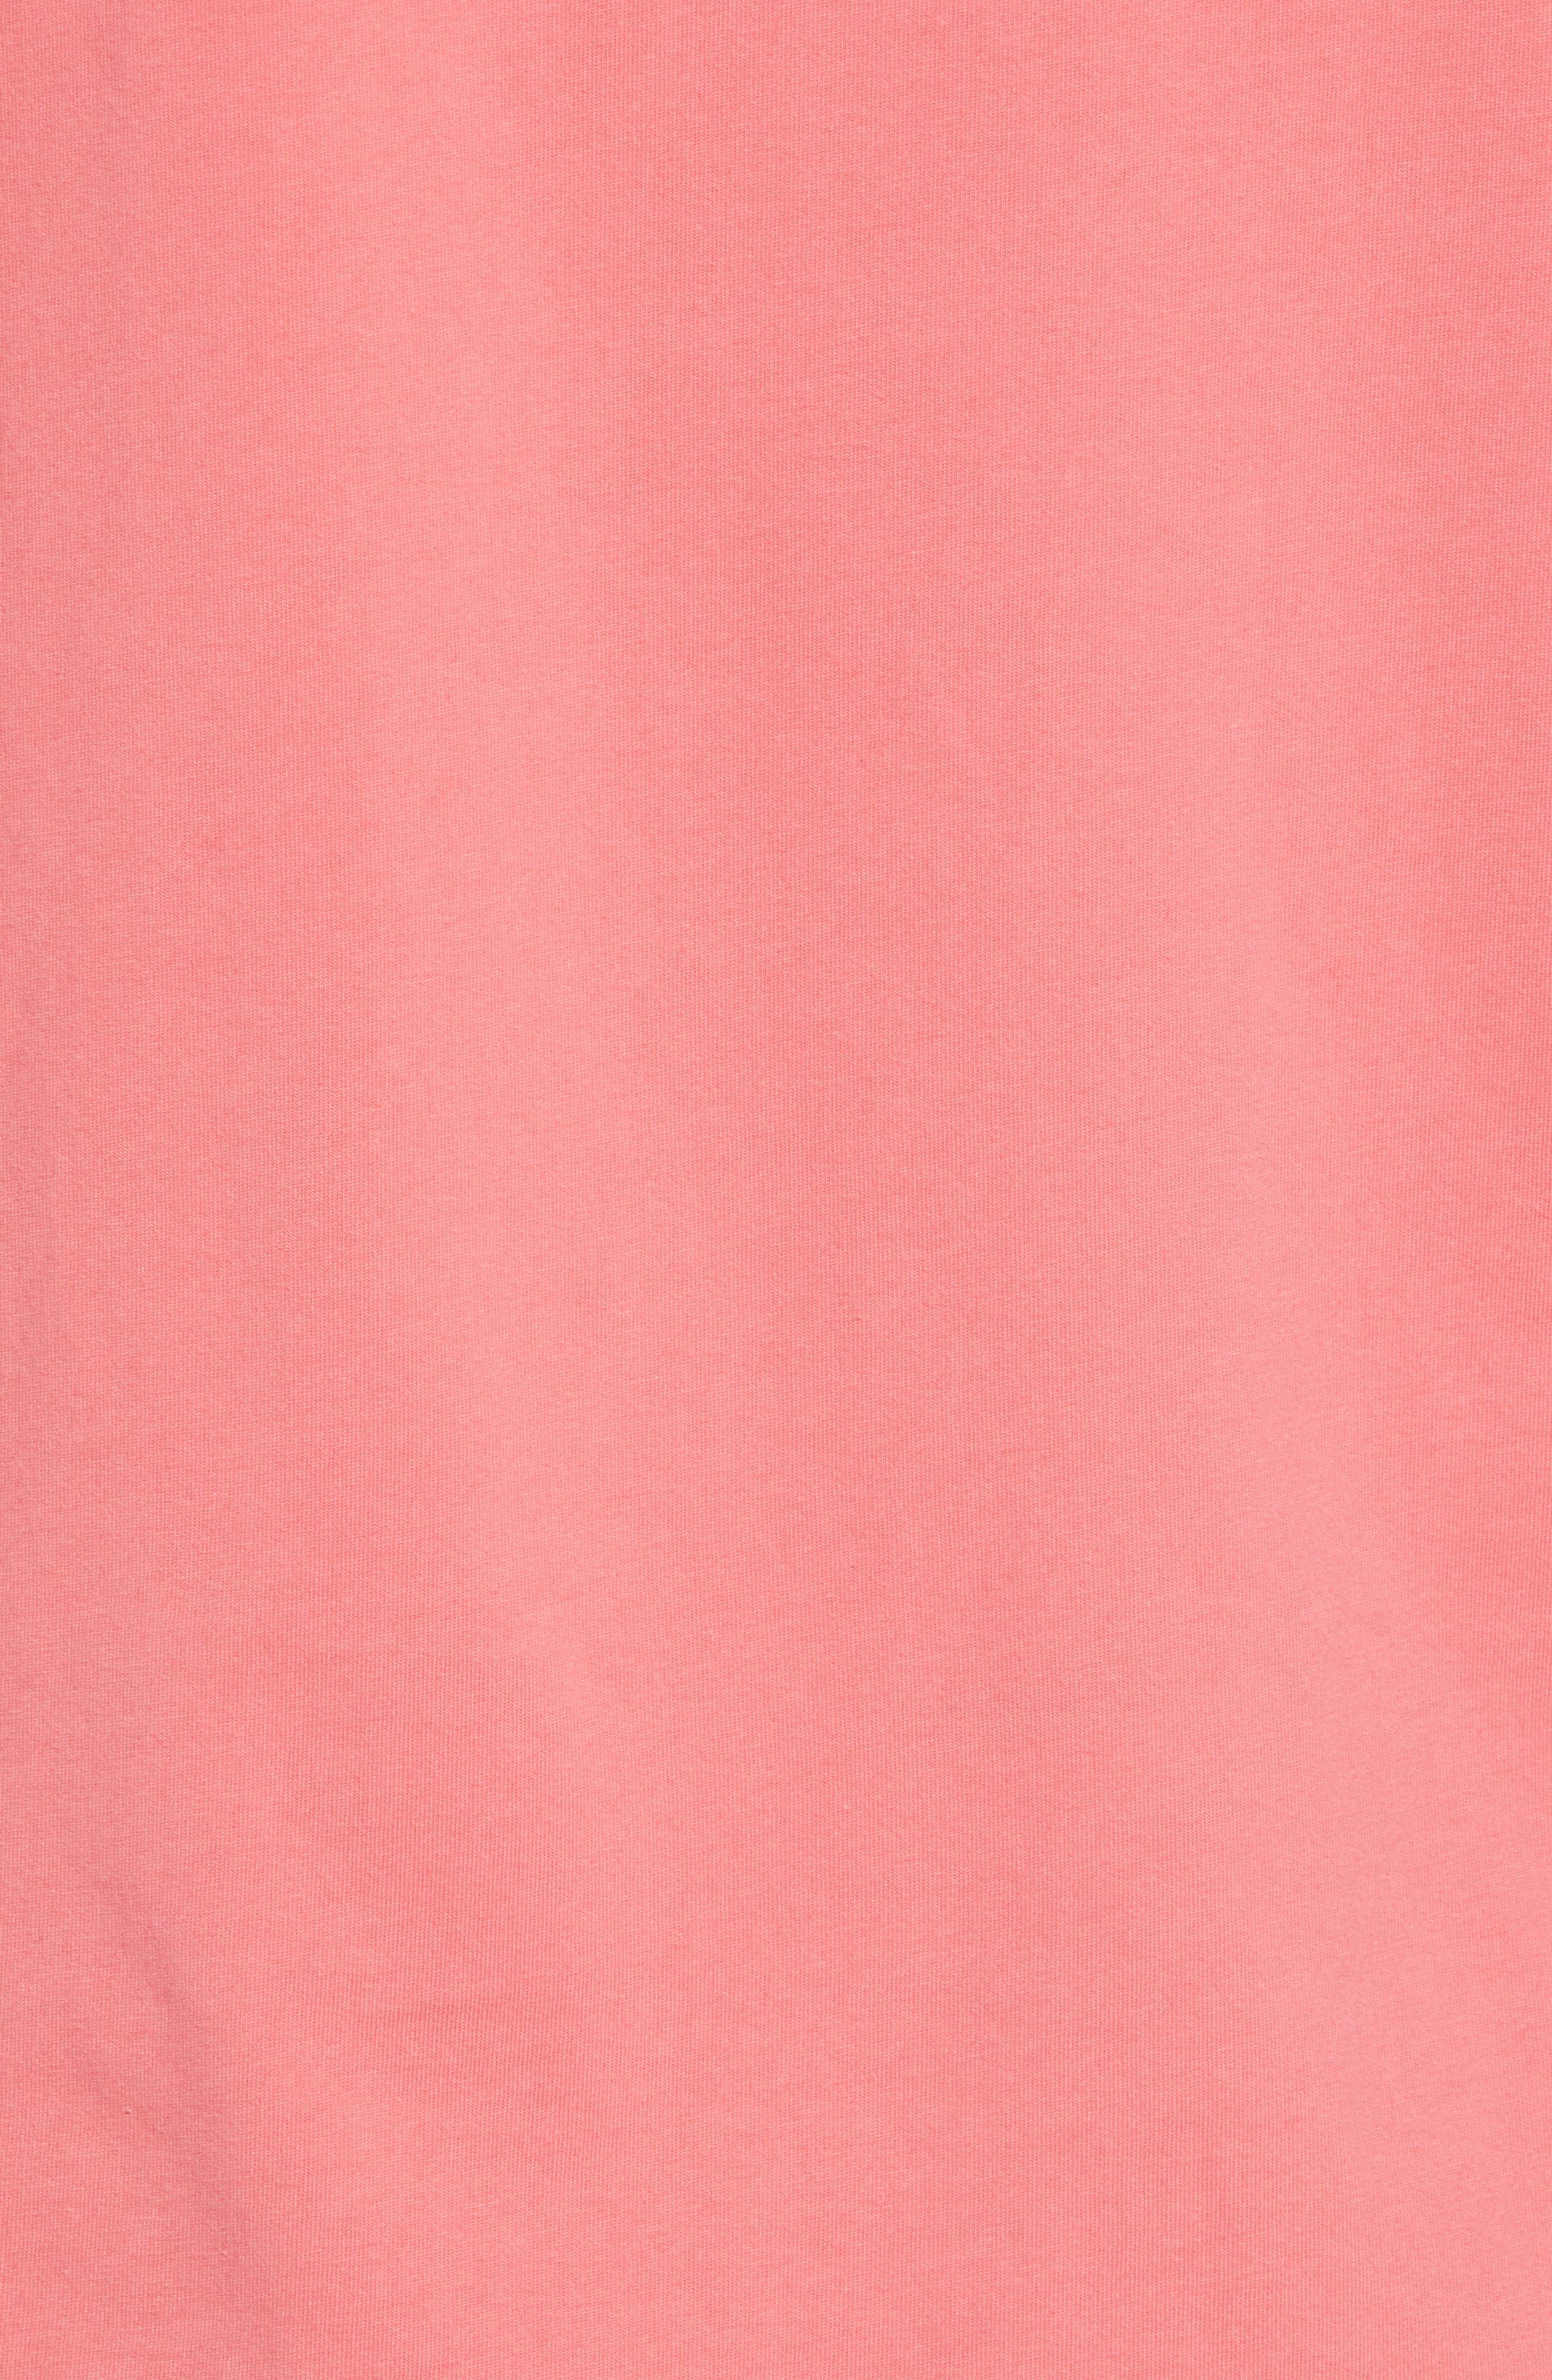 Knockout Lacrosse Pocket T-Shirt,                             Alternate thumbnail 5, color,                             SAILORS RED